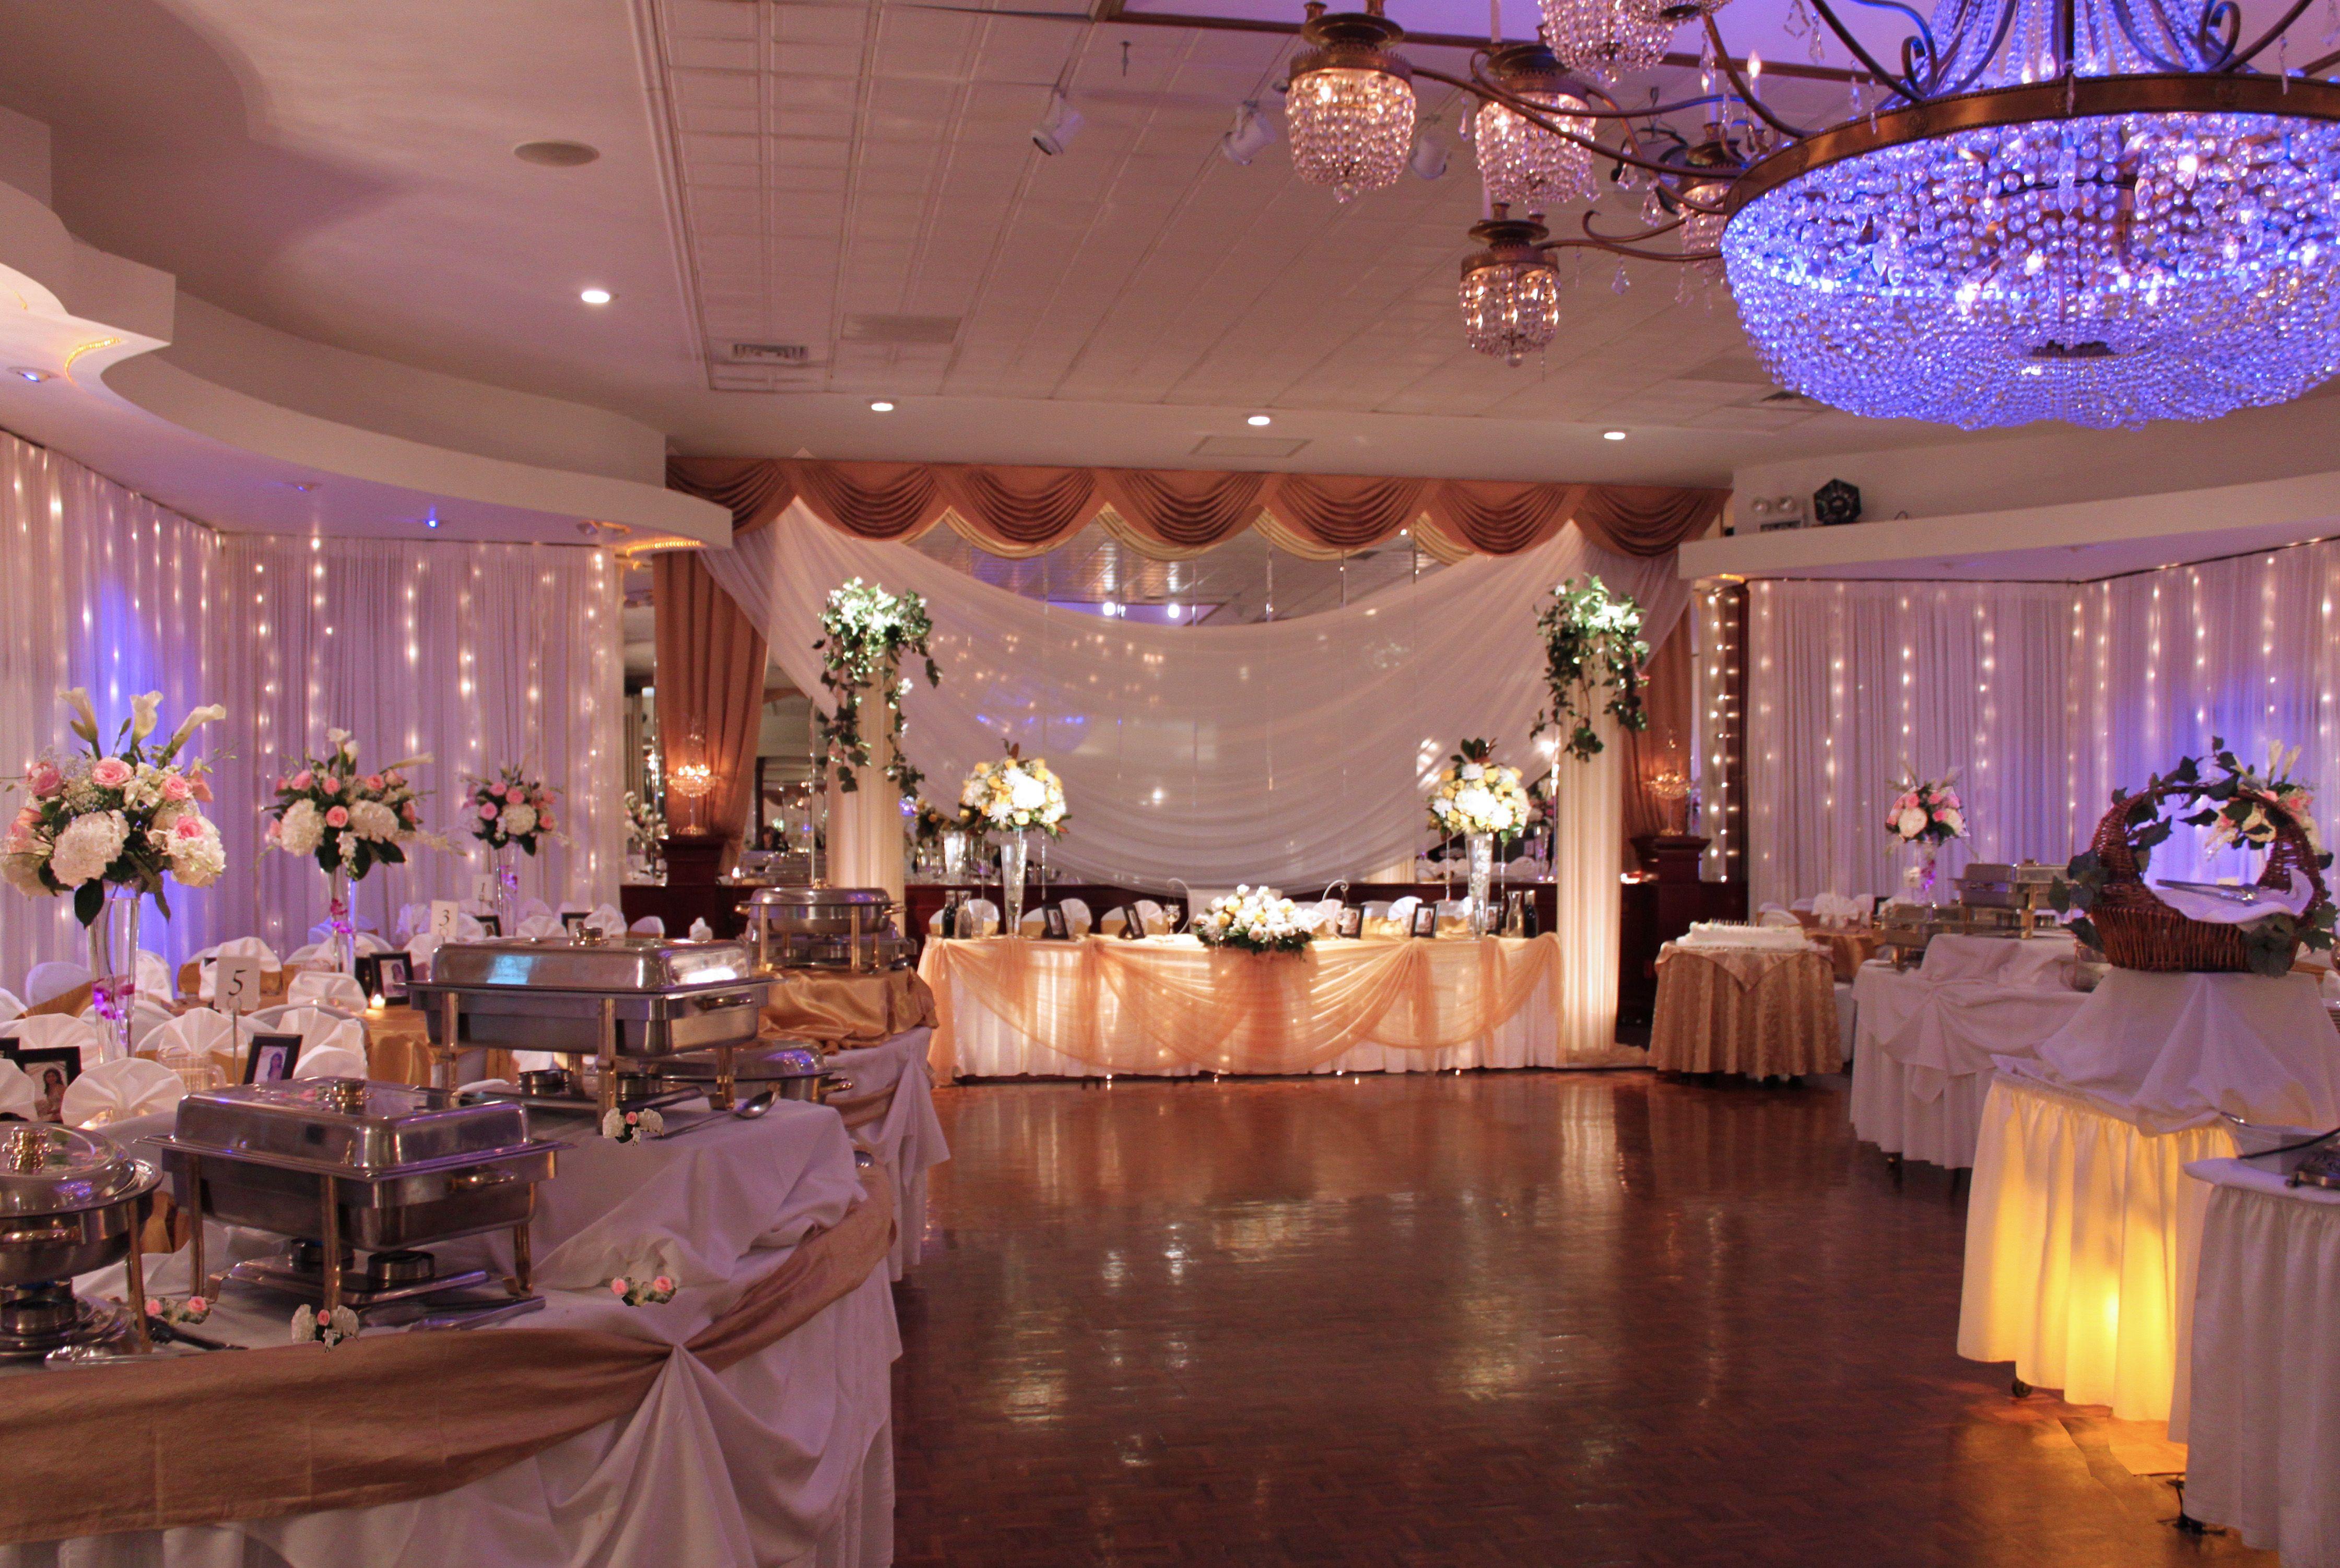 Simple Elegant Wedding Decor At Princess Manor